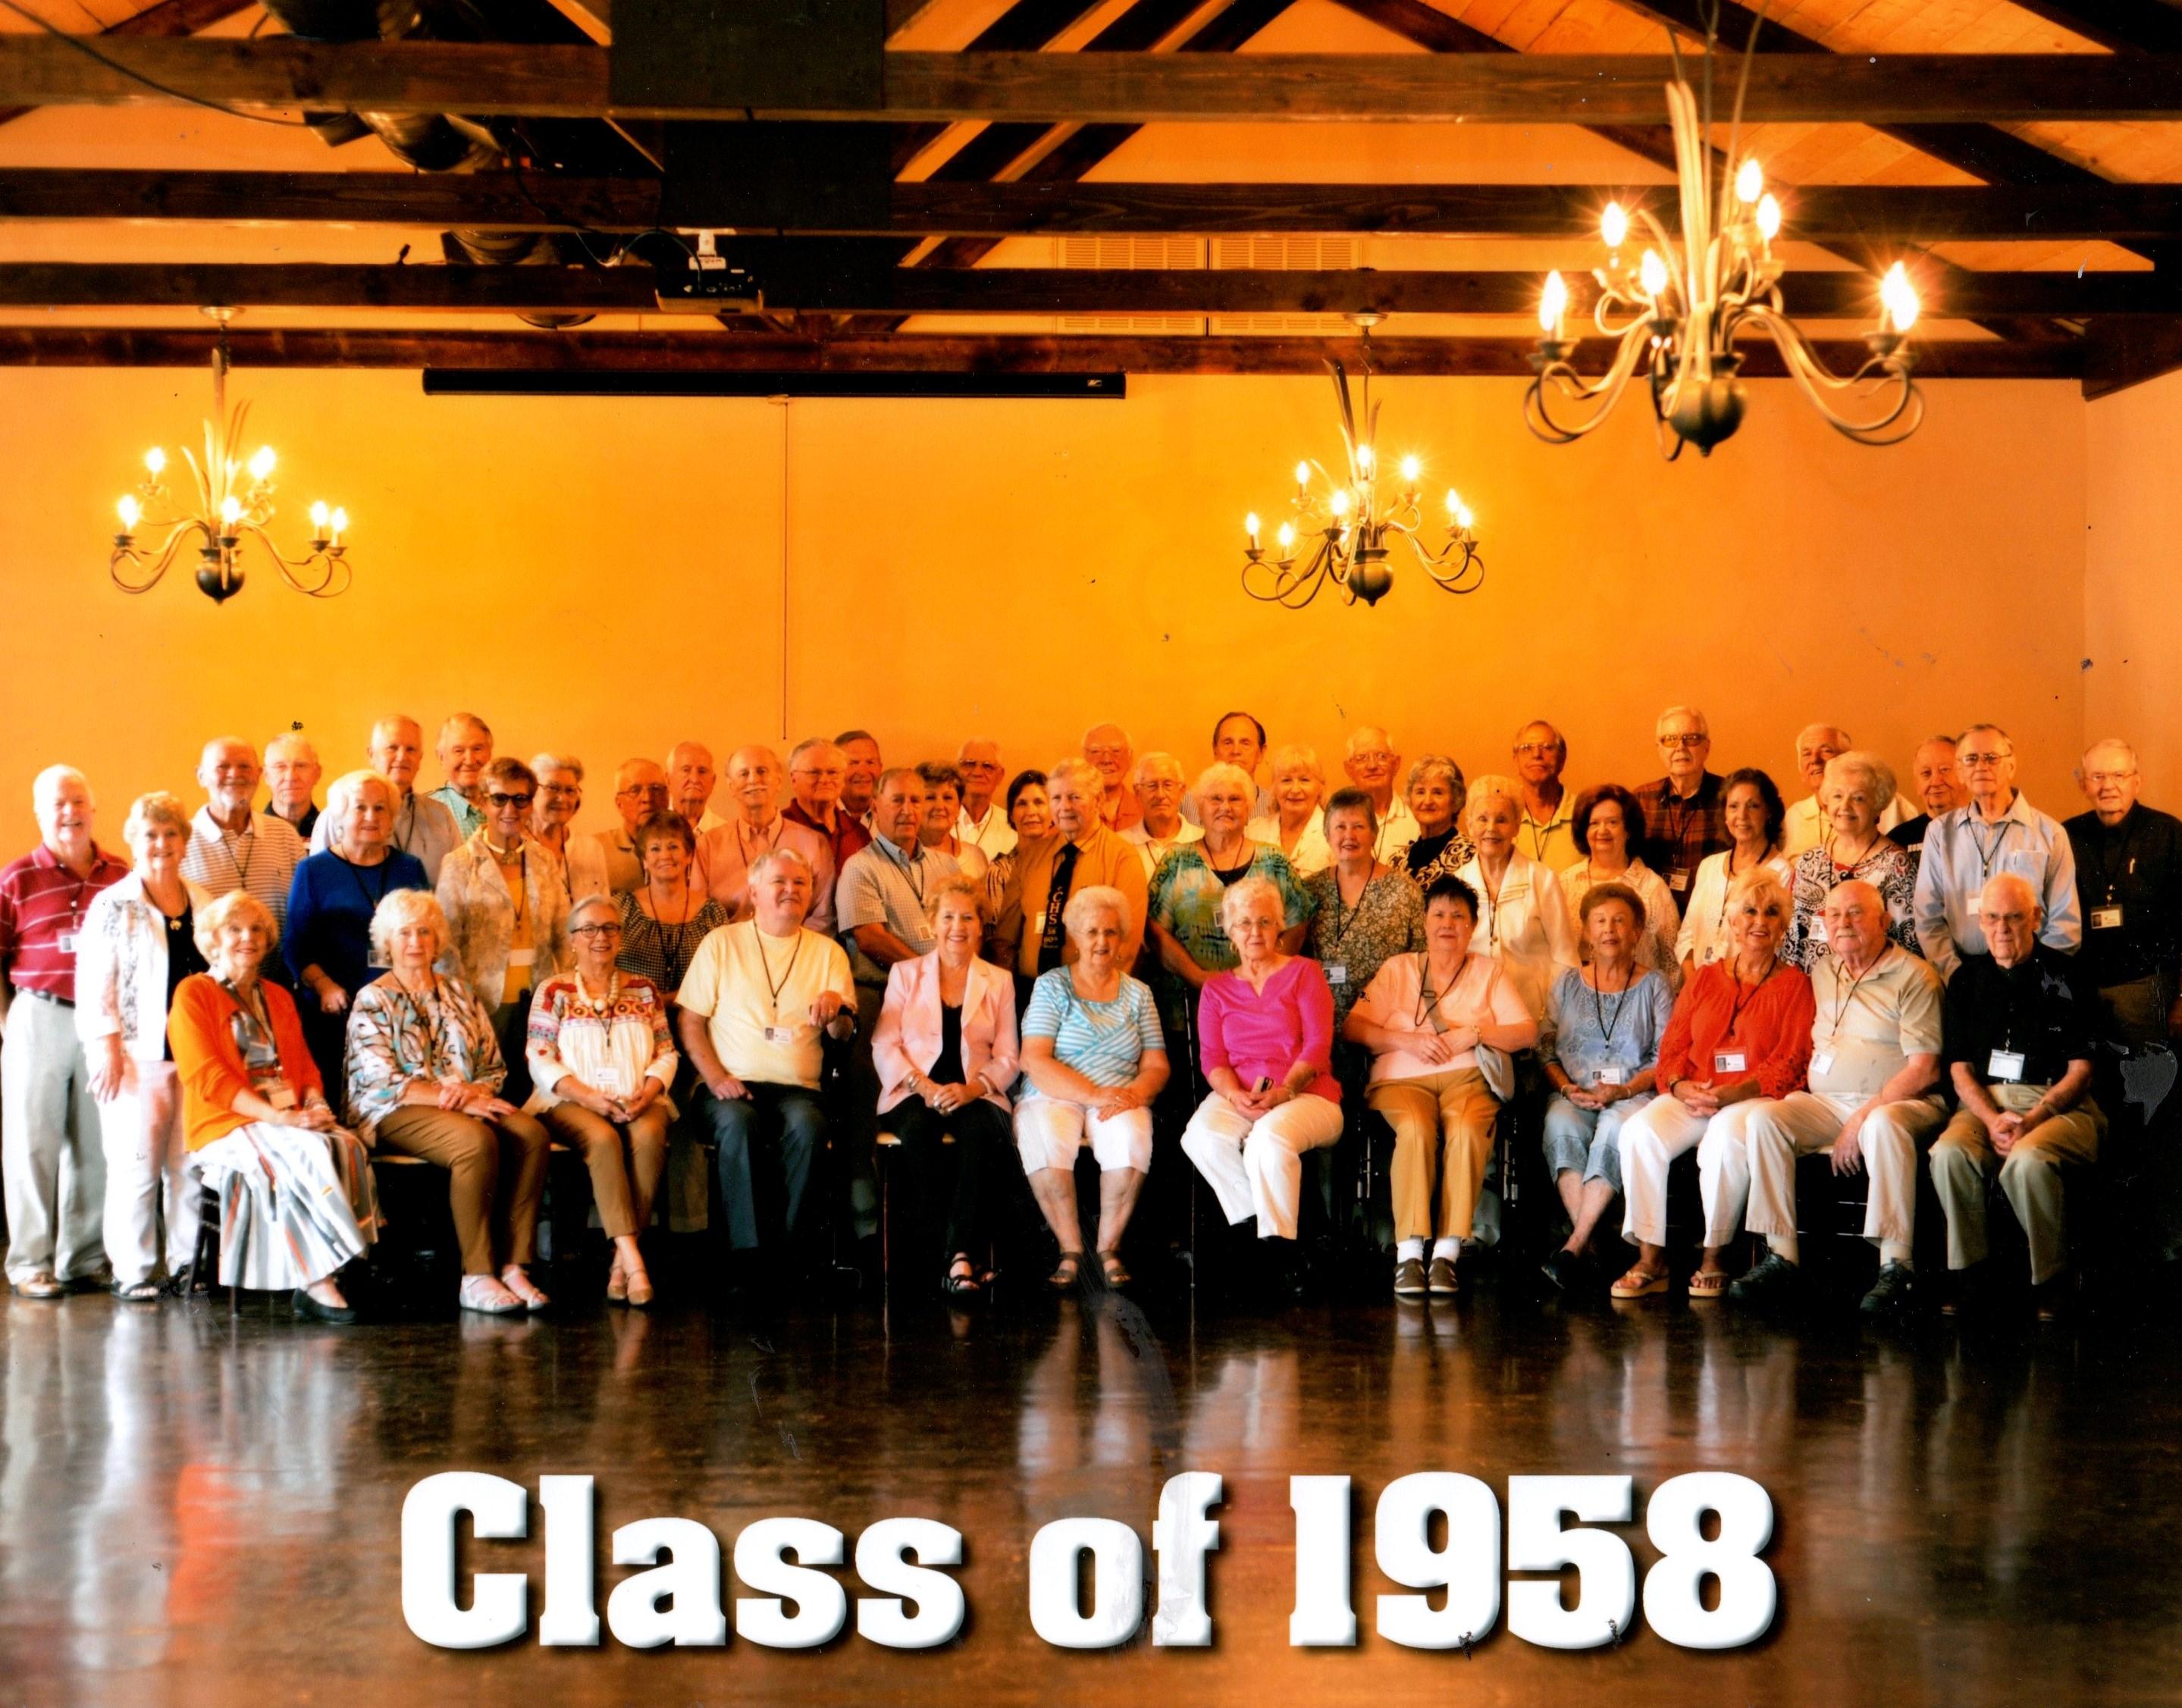 cullman_hs_class_of_1958_60th_reunion_photo.jpg